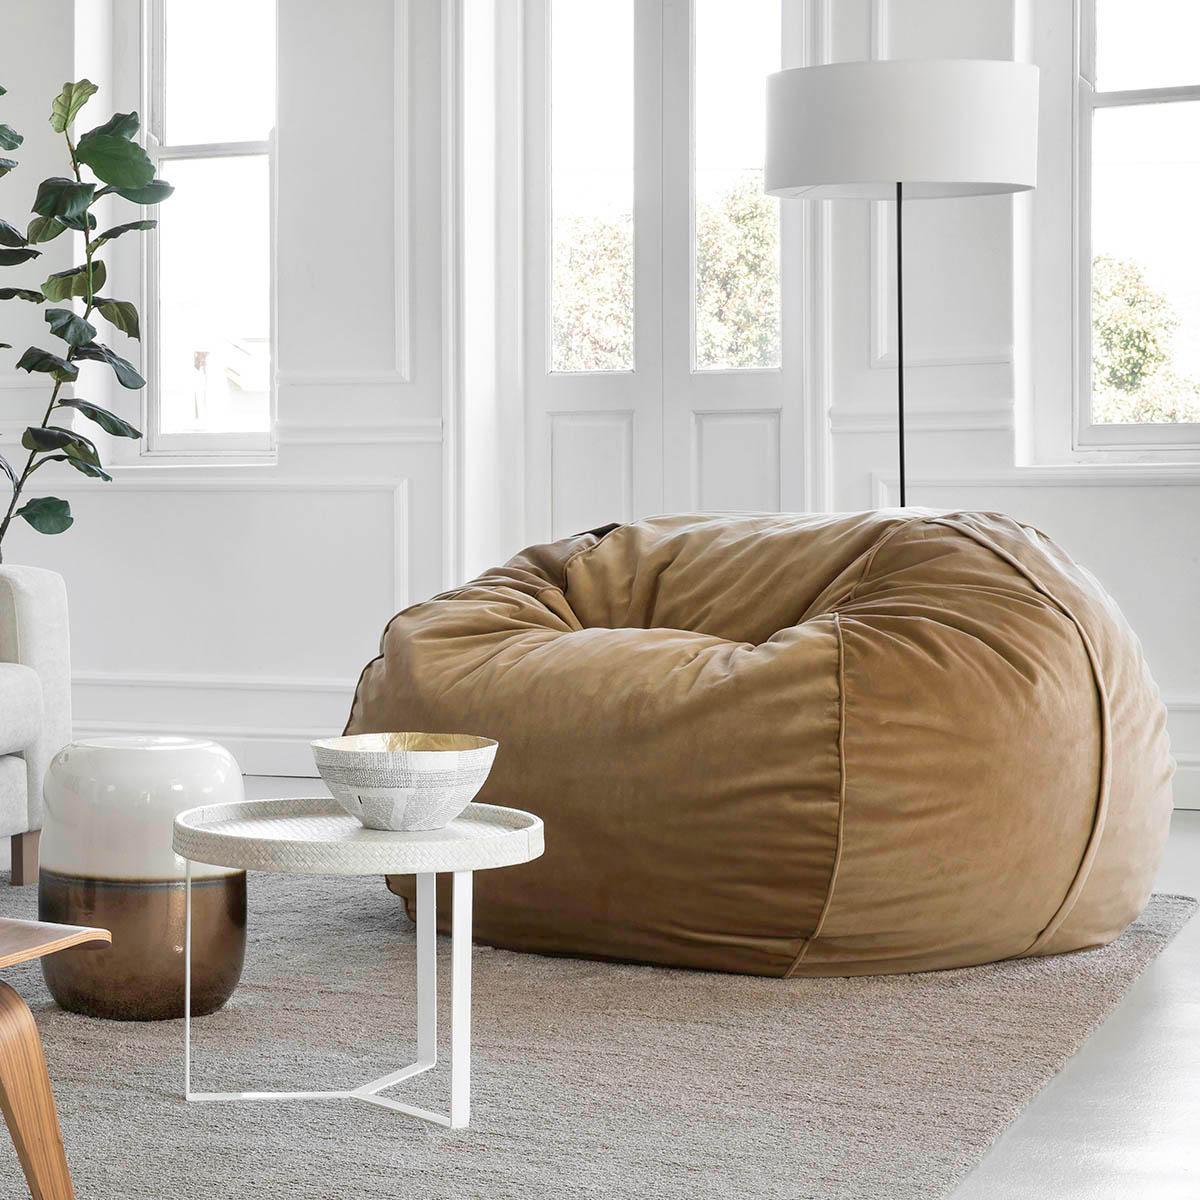 sitzsack beige latest sitzsack evolution sofa outdoor. Black Bedroom Furniture Sets. Home Design Ideas